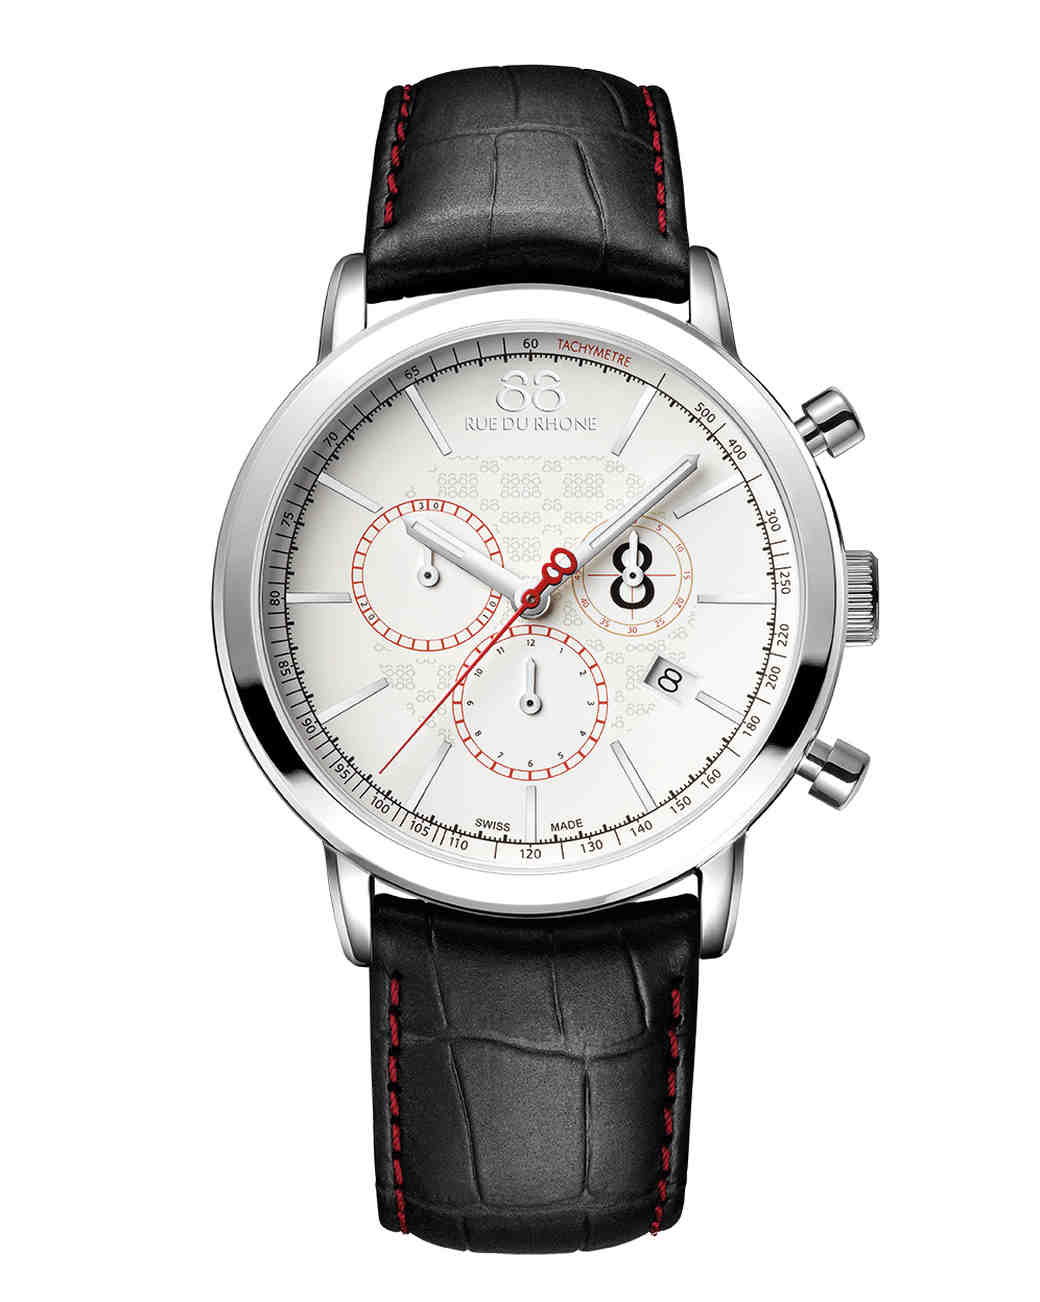 88 Rue du Rhone Broadway Watch